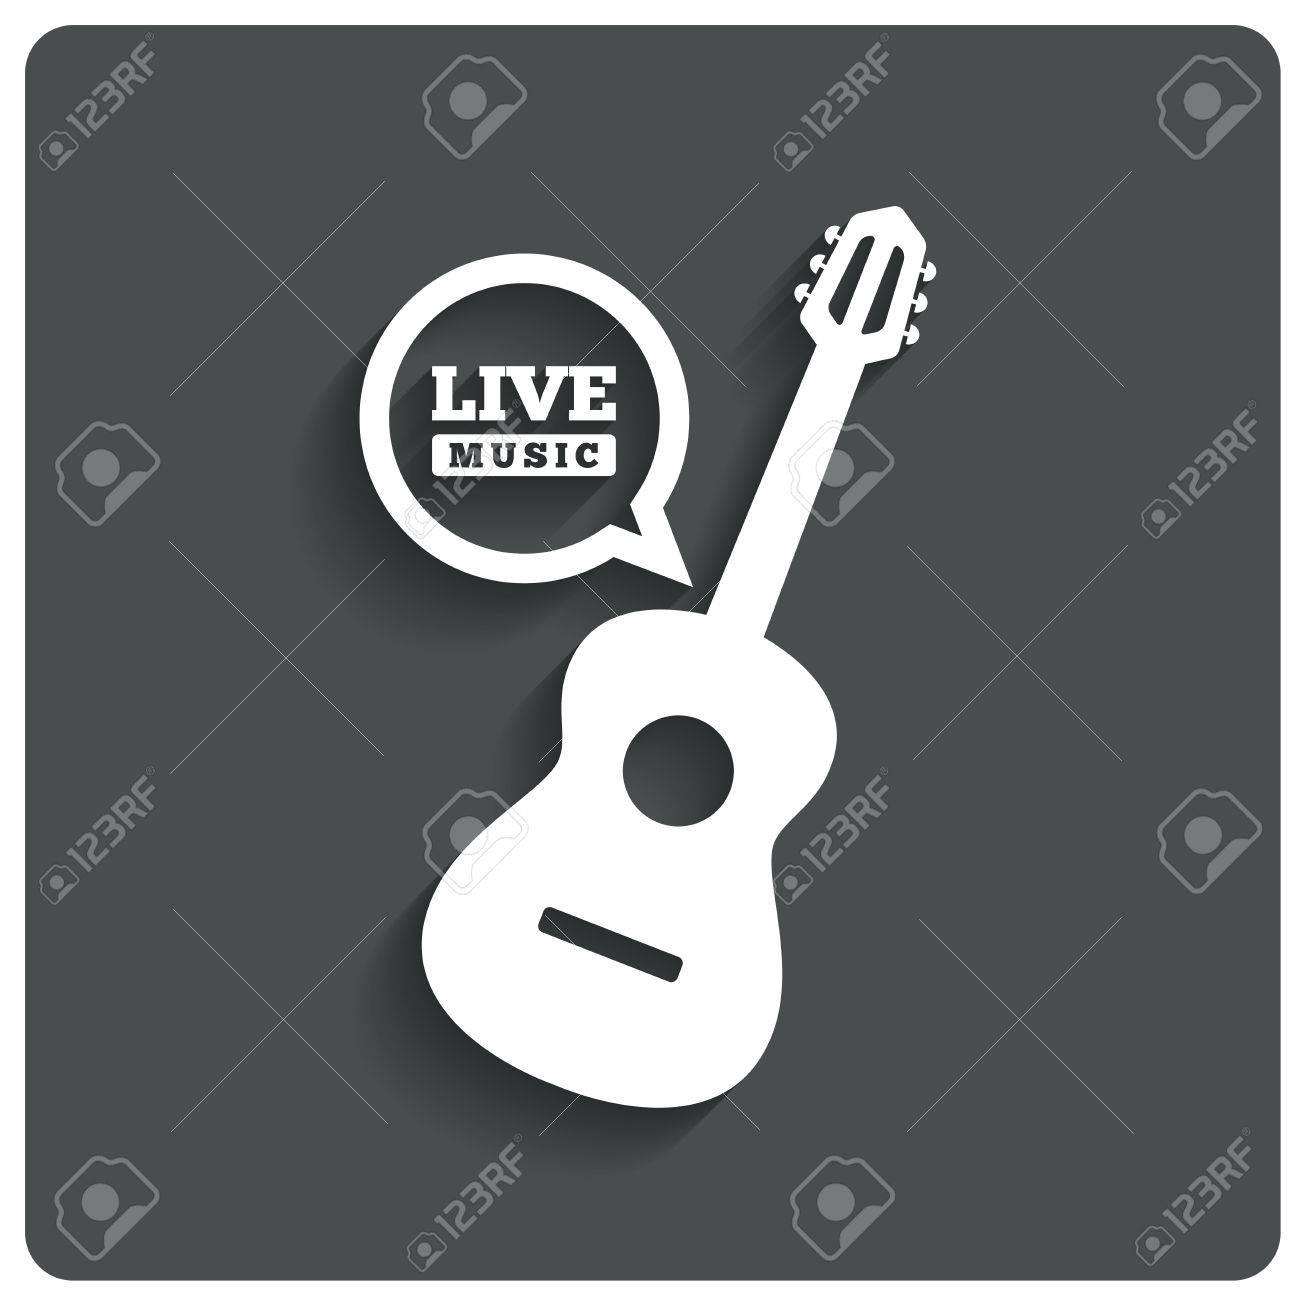 Acoustic guitar icon  Live music symbol  Karaoke symbol  Restaurant